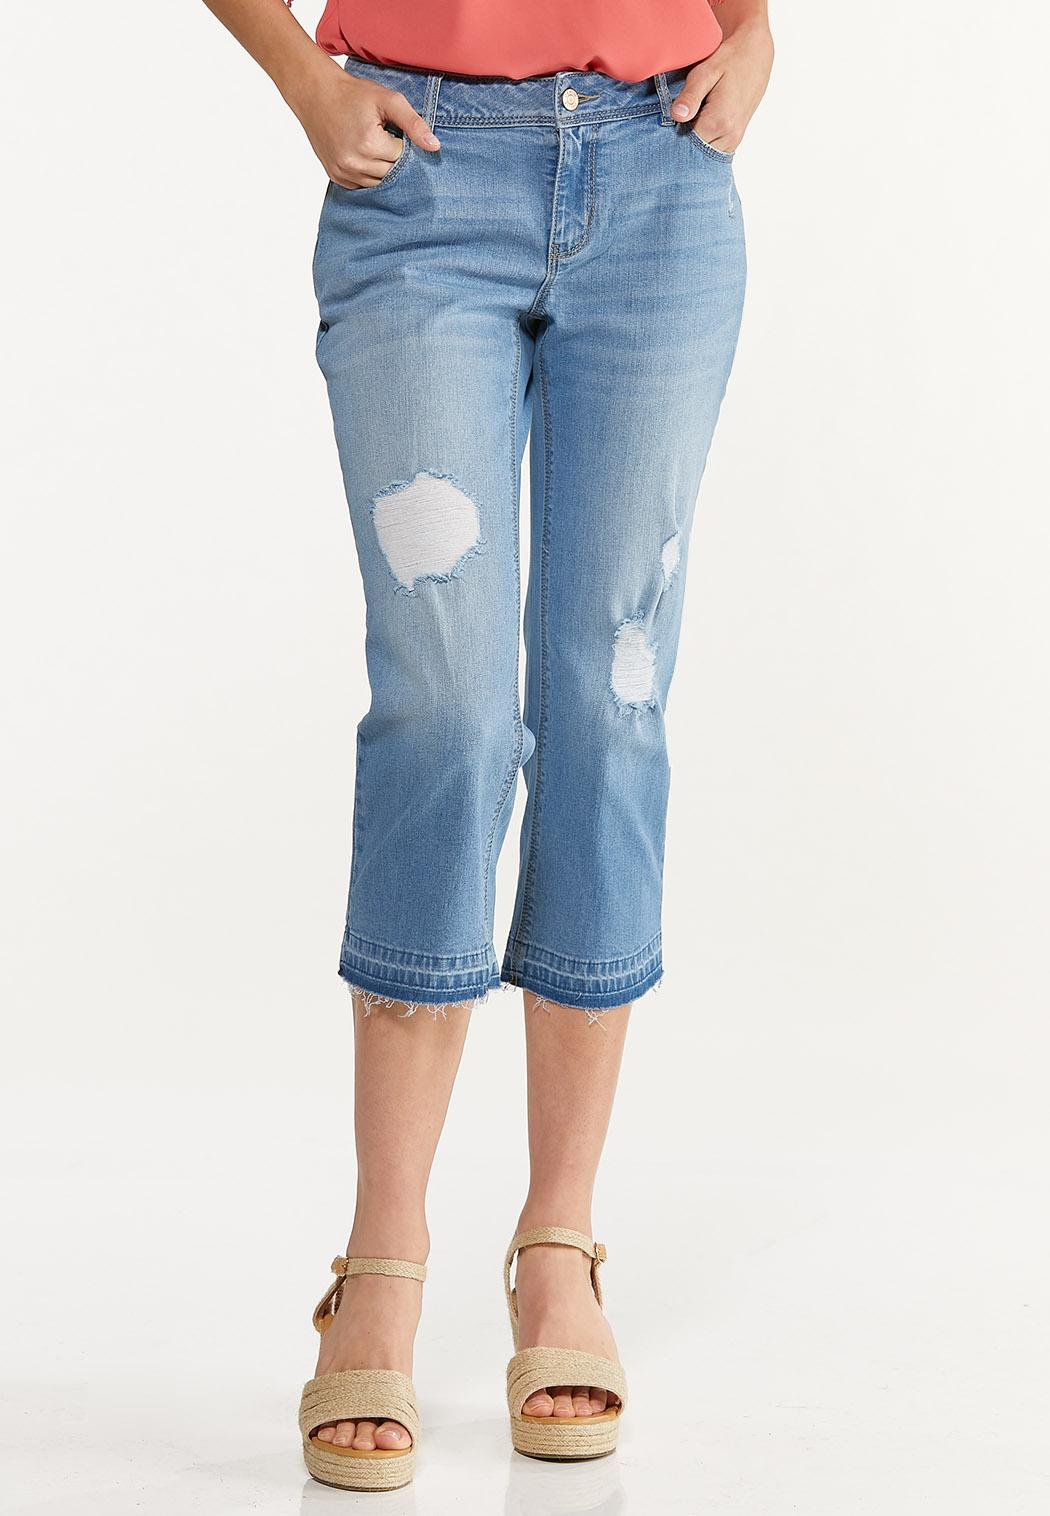 Cropped Release Hem Jeans